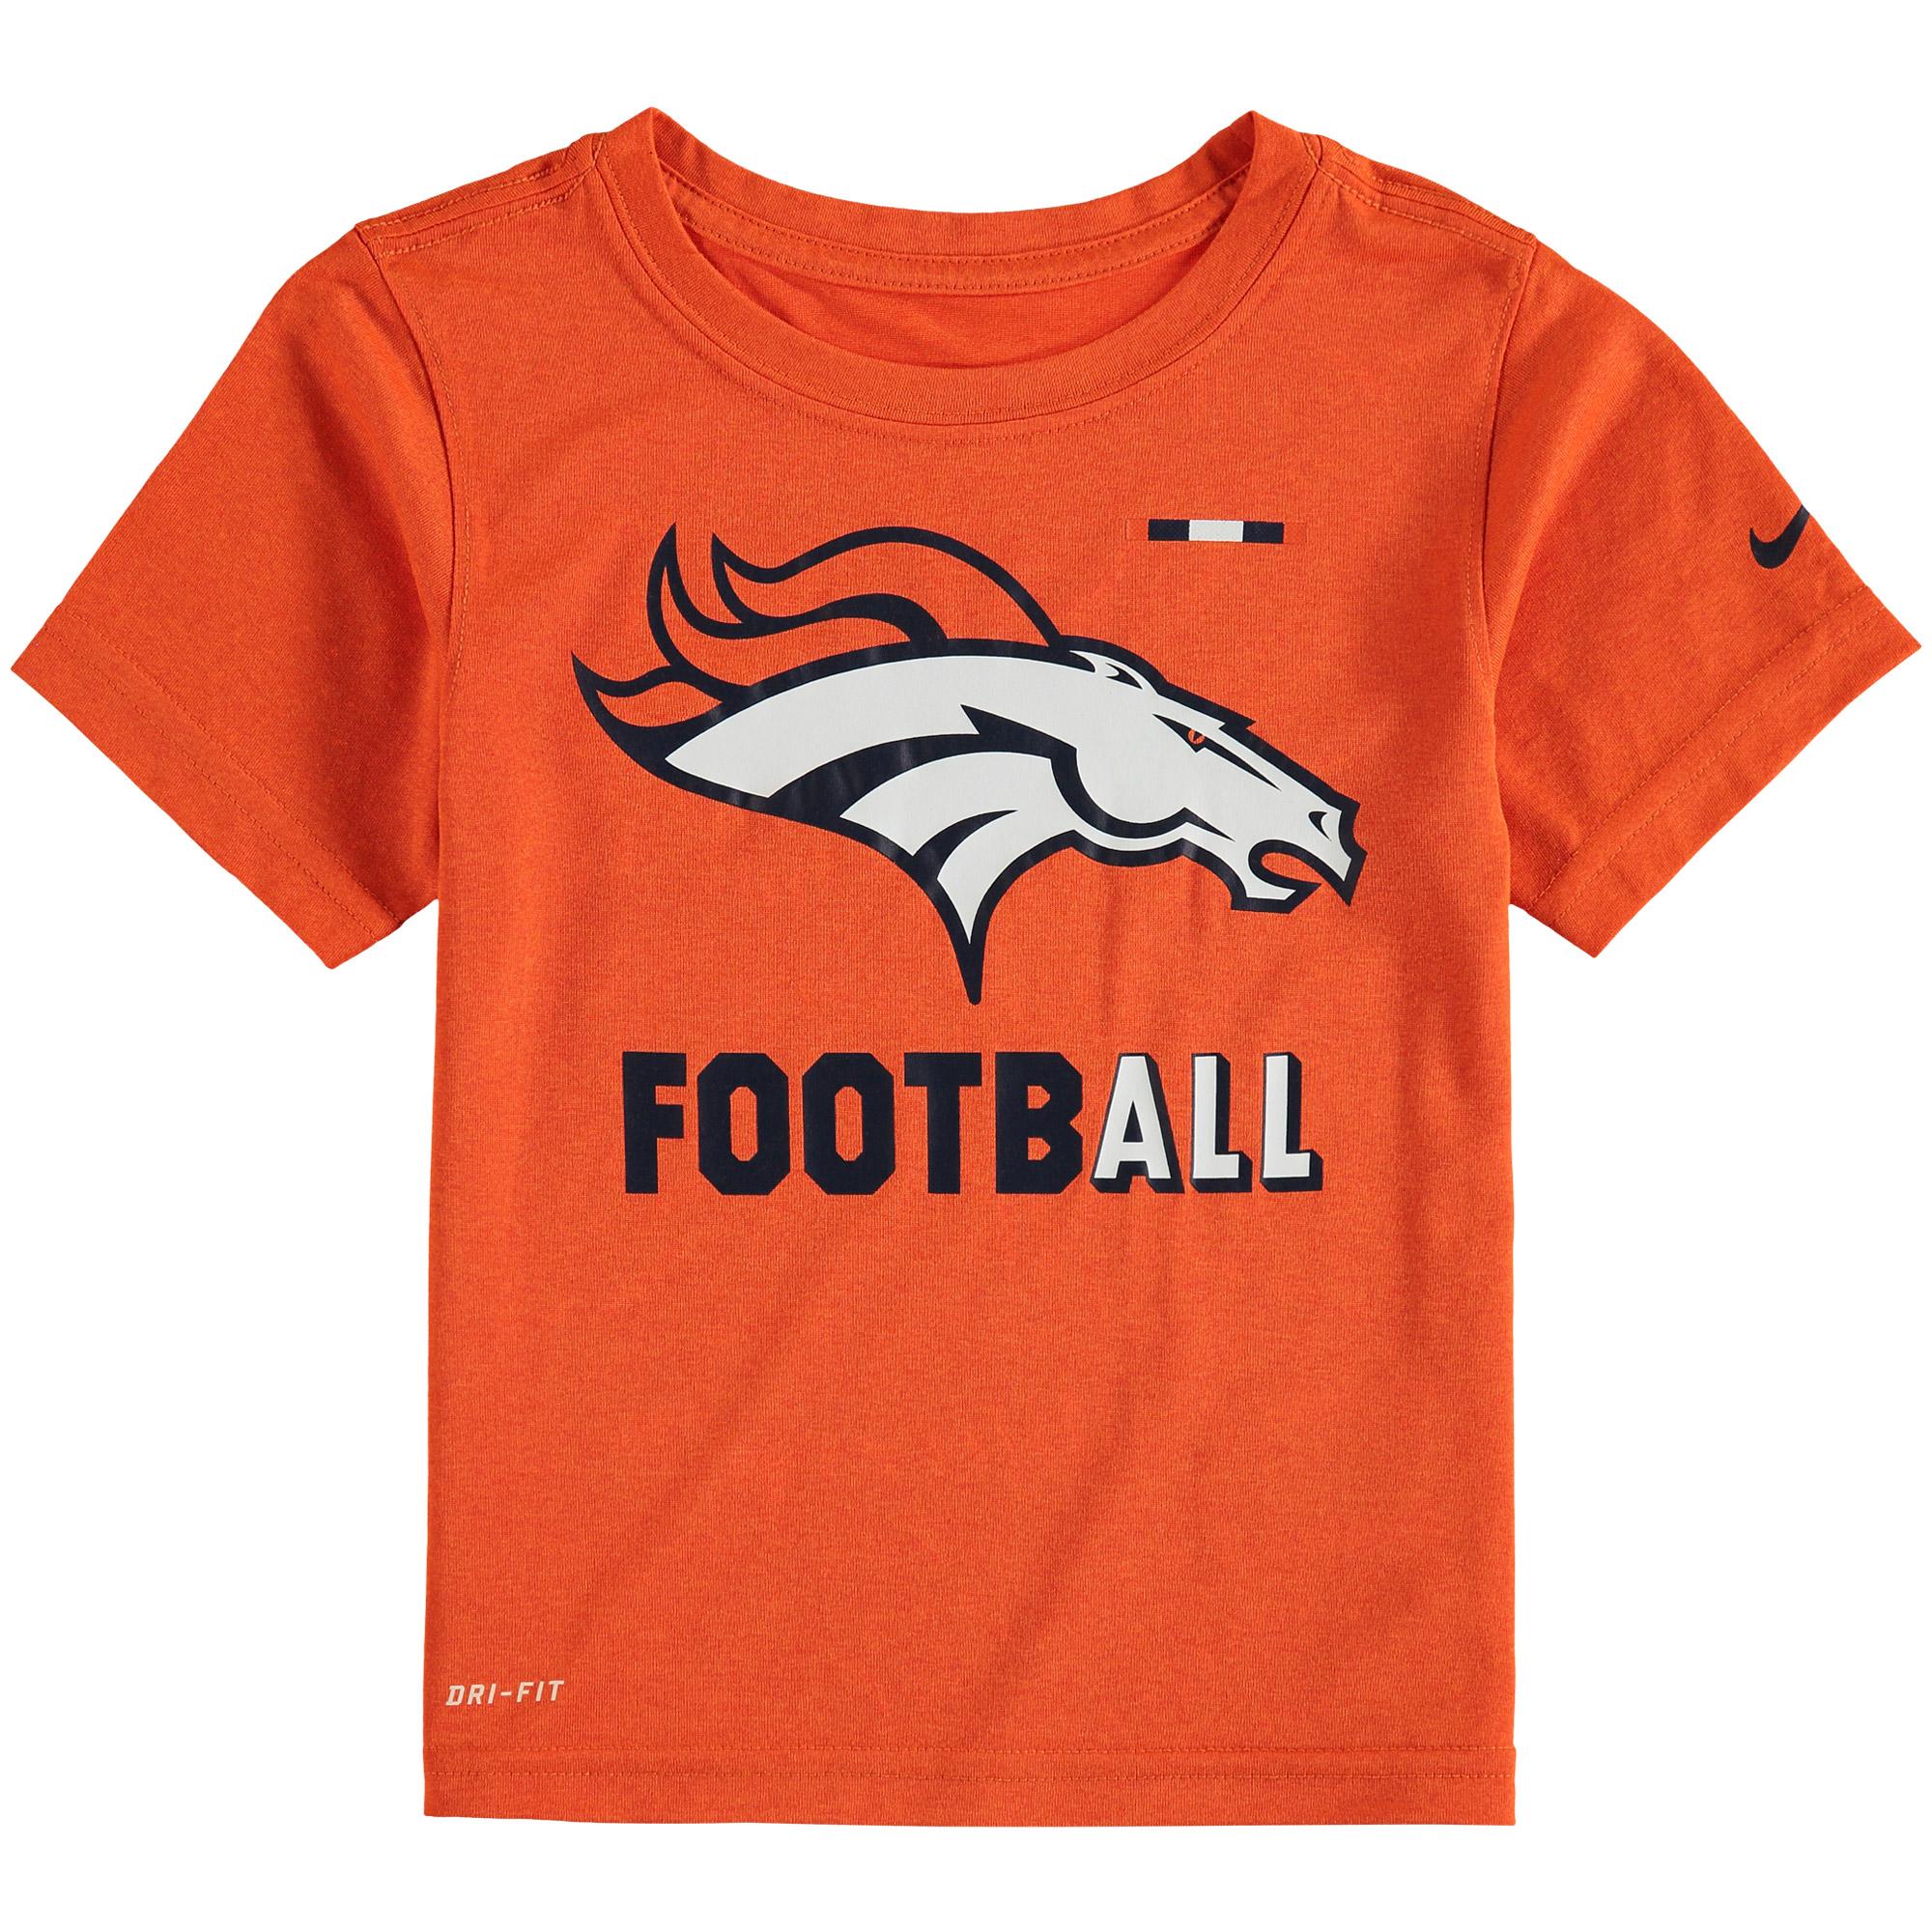 Denver Broncos Nike Toddler Legend Football Performance T-Shirt - Orange